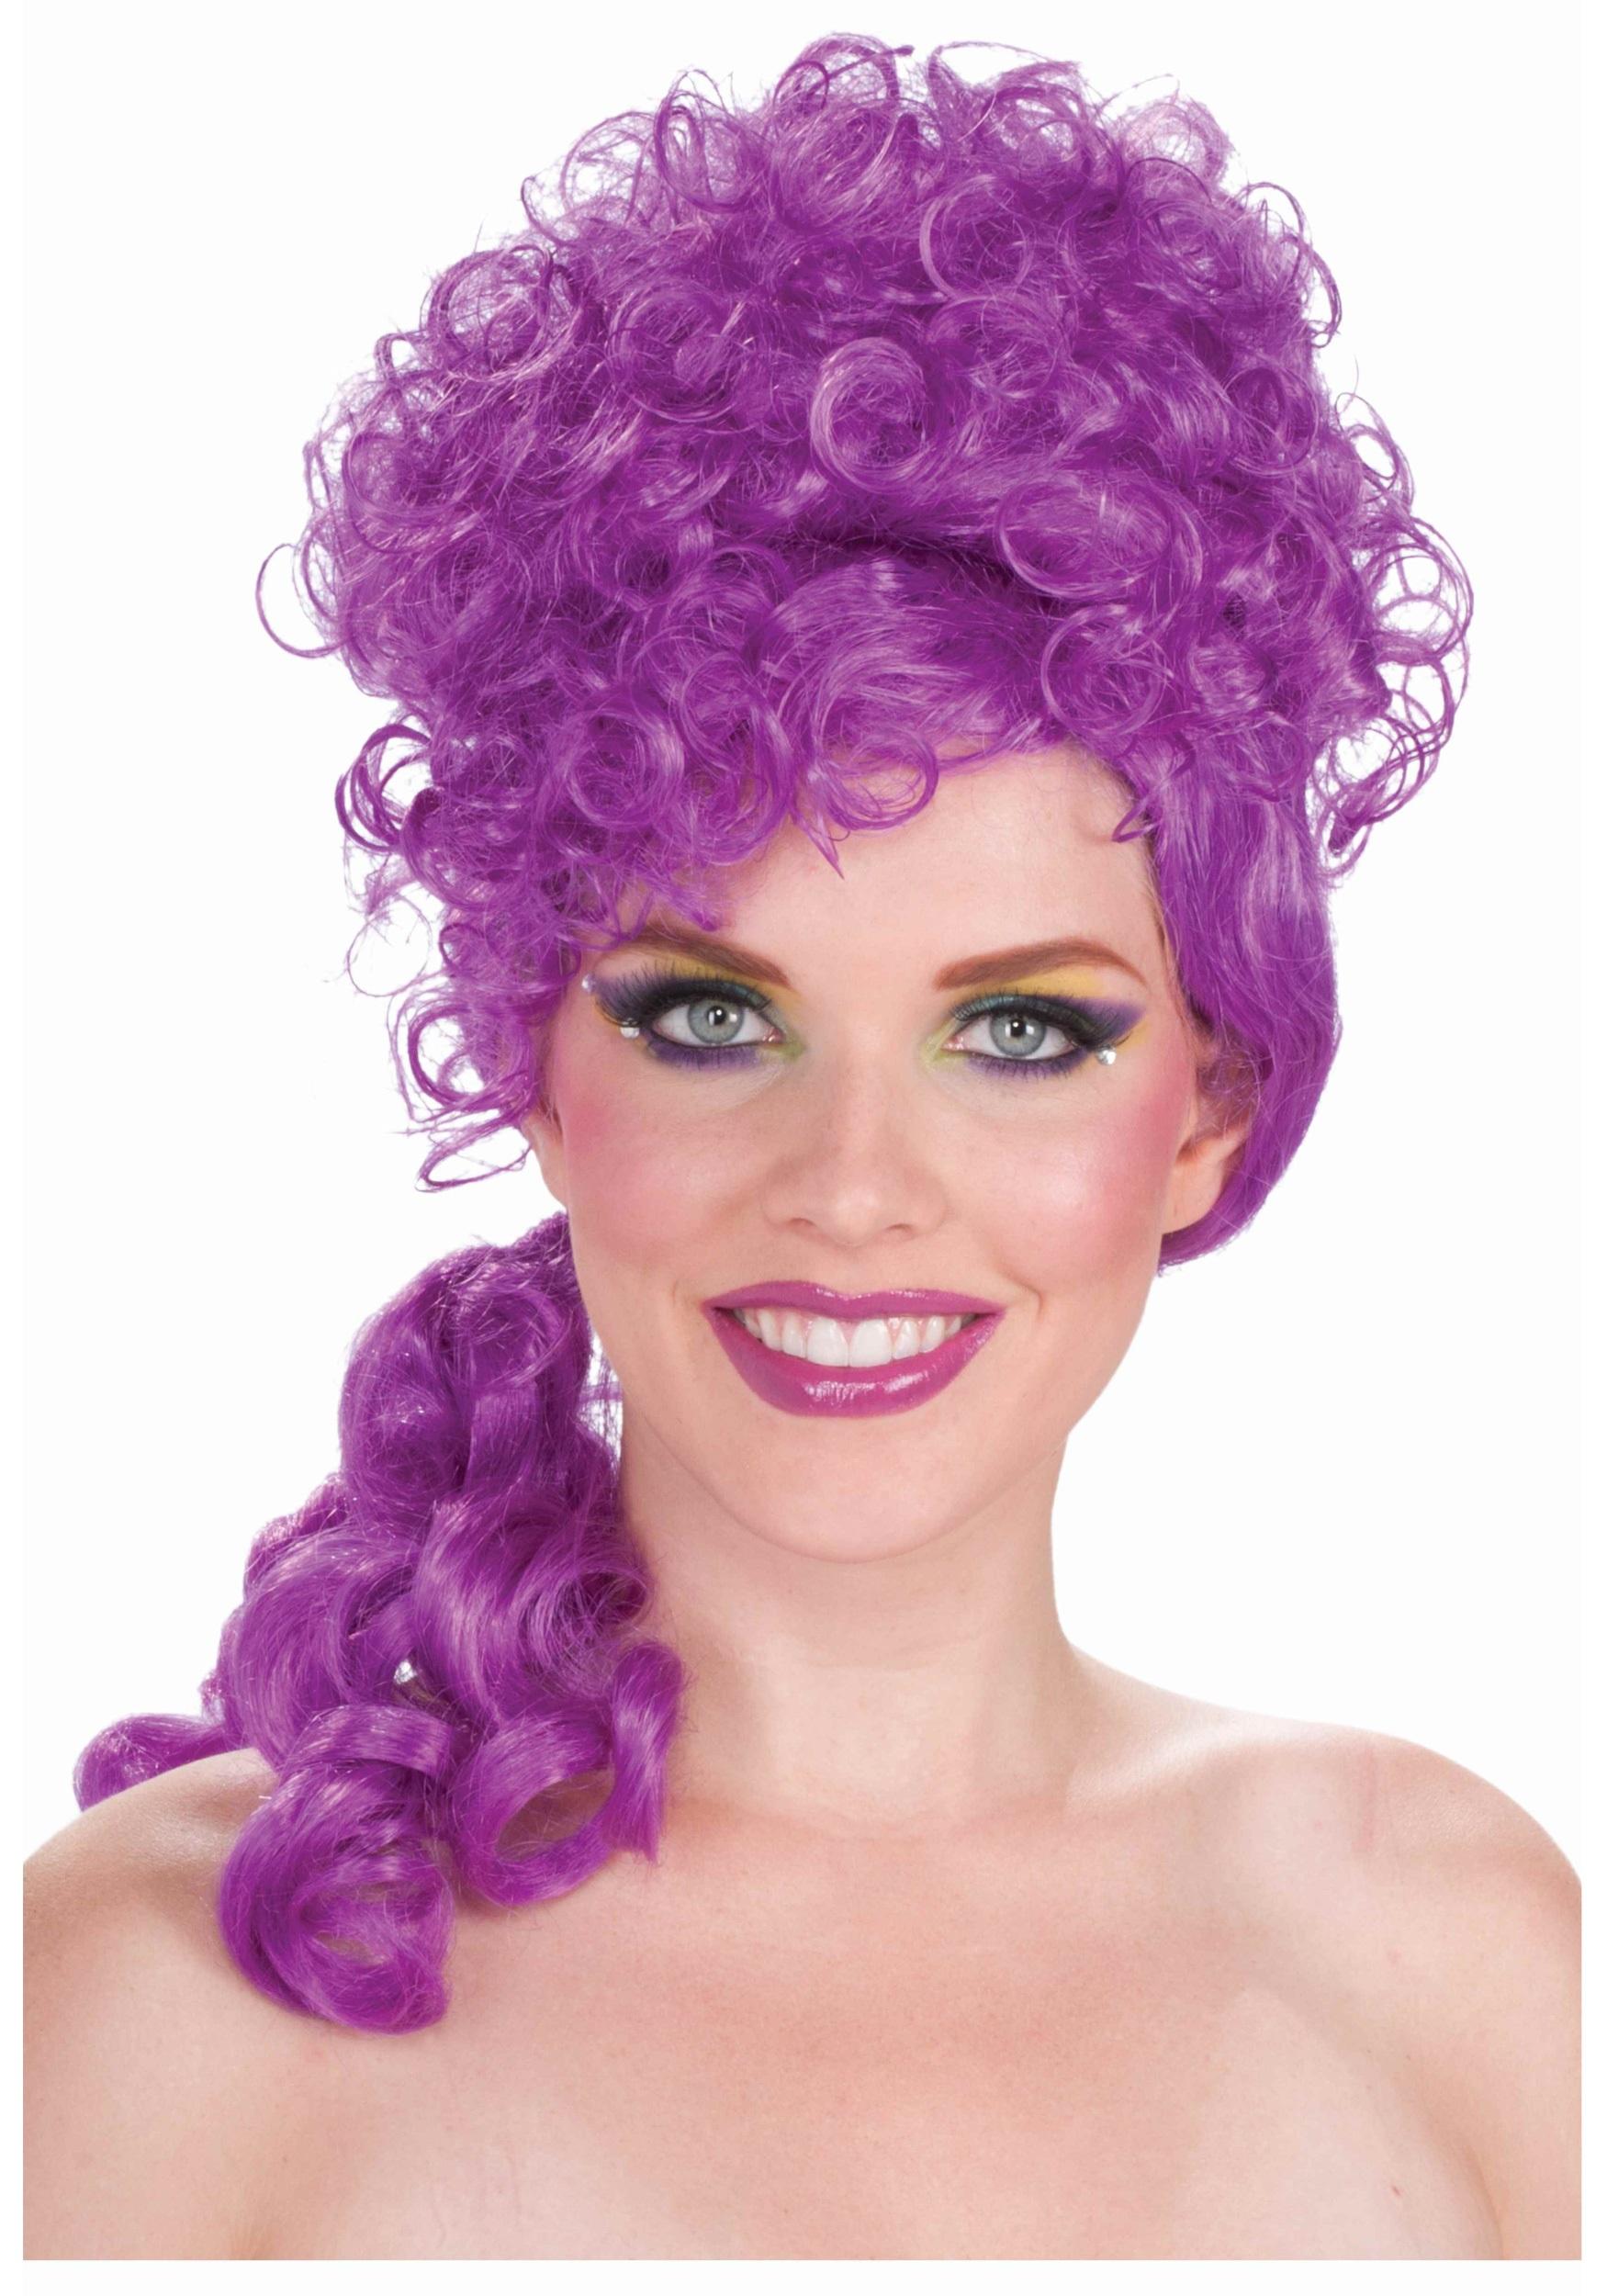 Purple Big Top Clown Wig Purple Hair Costume Wigs For Women